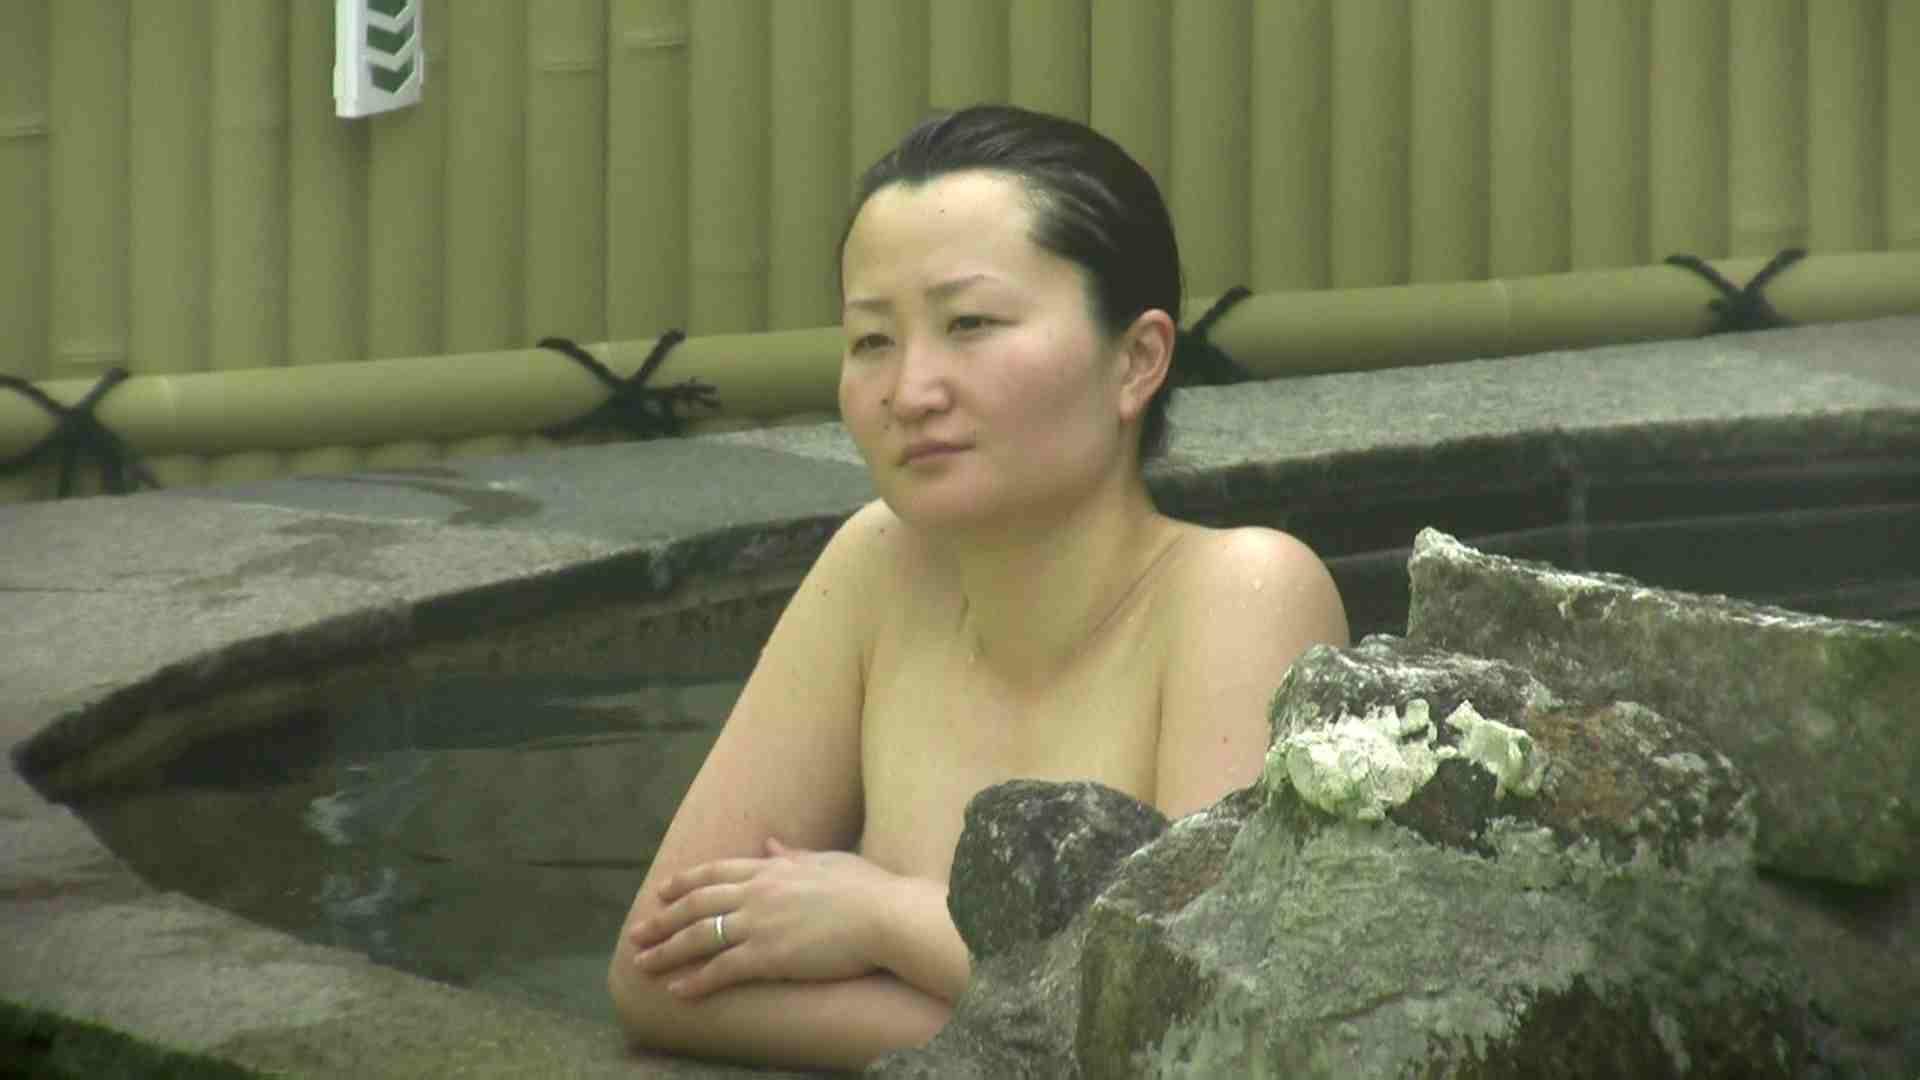 Aquaな露天風呂Vol.632 露天 戯れ無修正画像 70画像 14